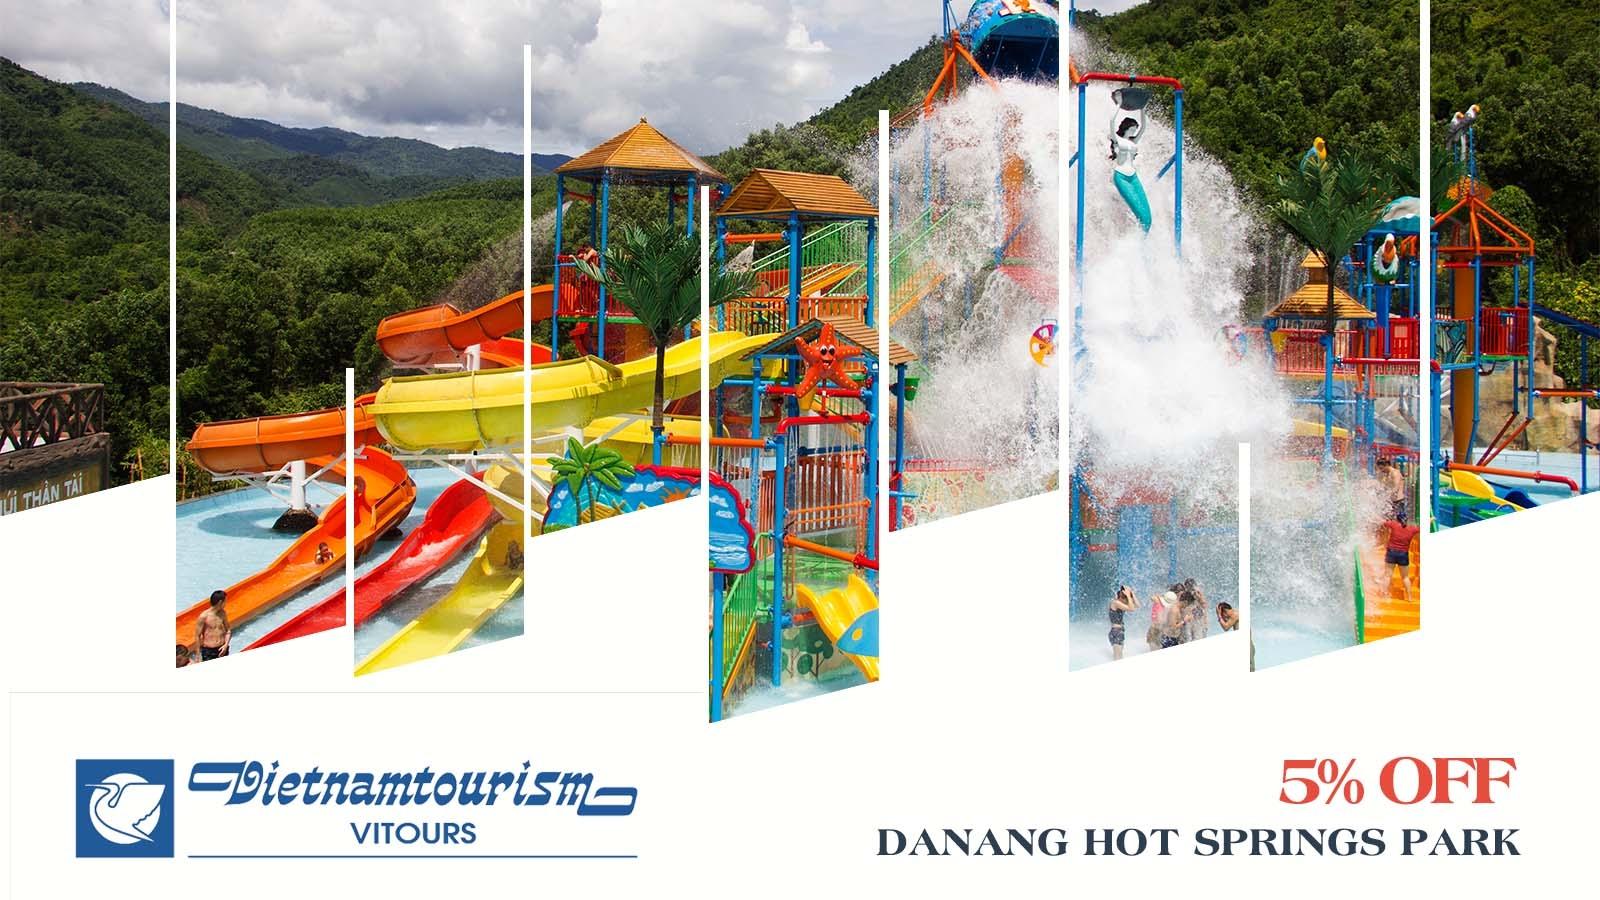 Vitours 5% OFF Danang Hot Springs Park 1